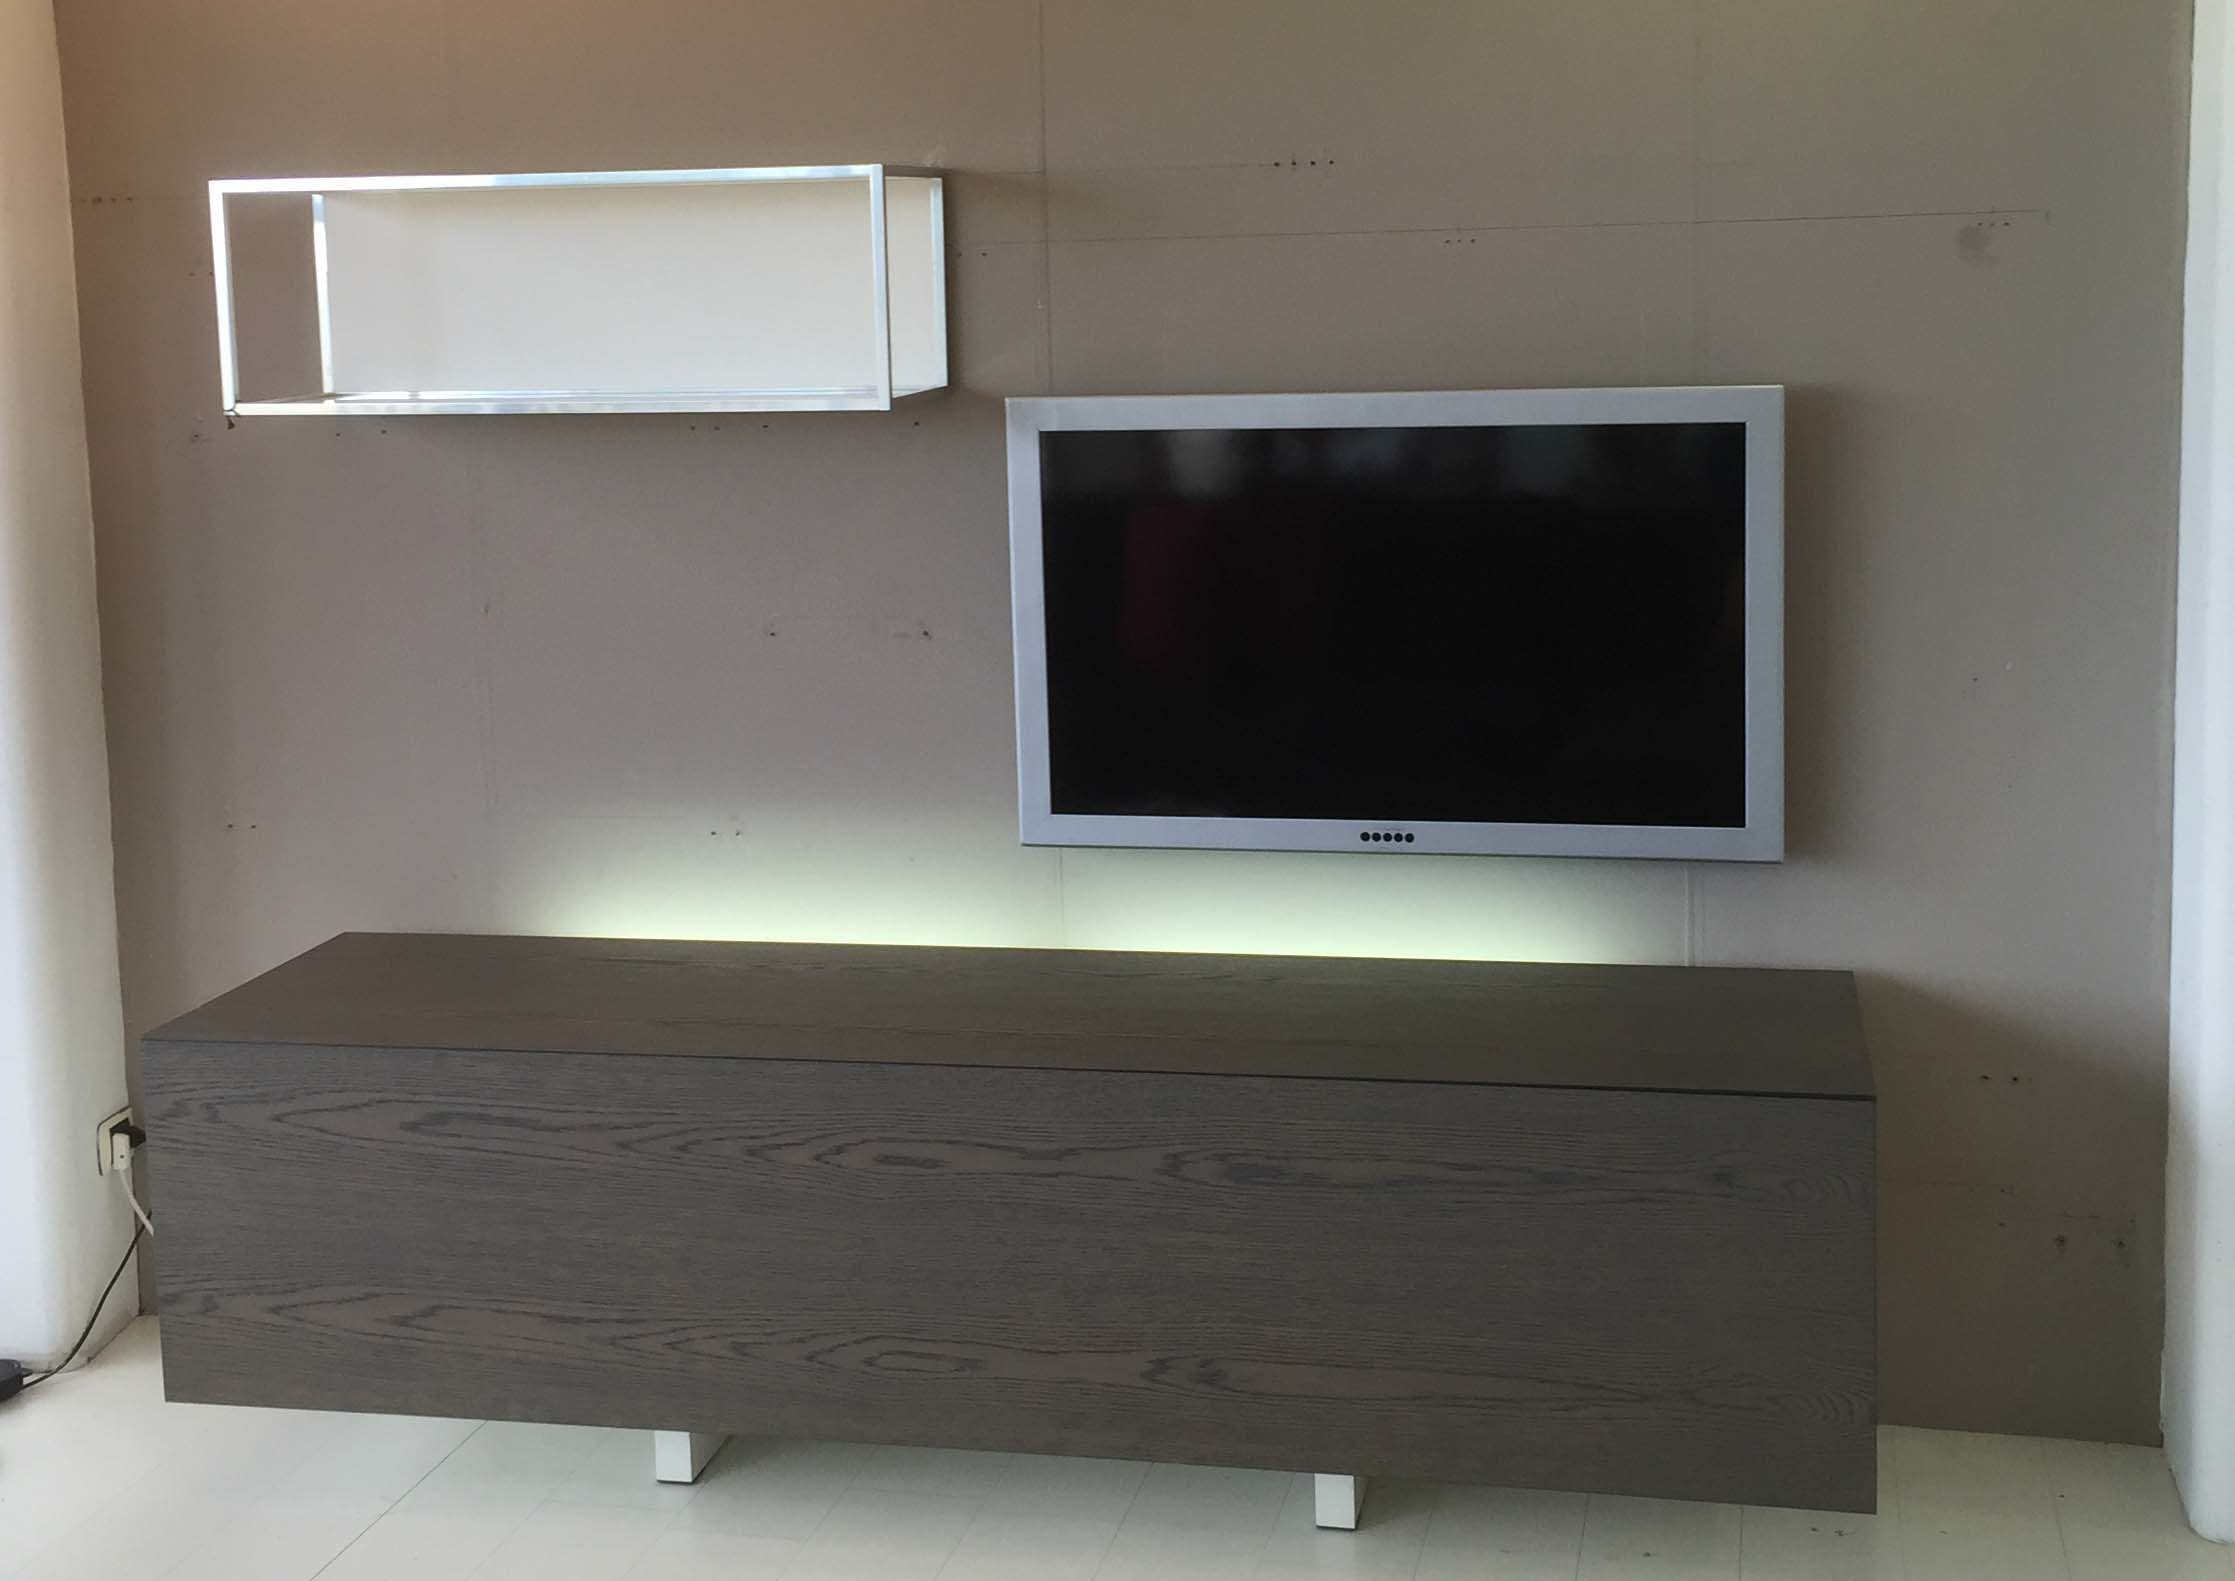 Mobile tv acerbis ludwing in legno rovere grigio for Acerbis arredamenti